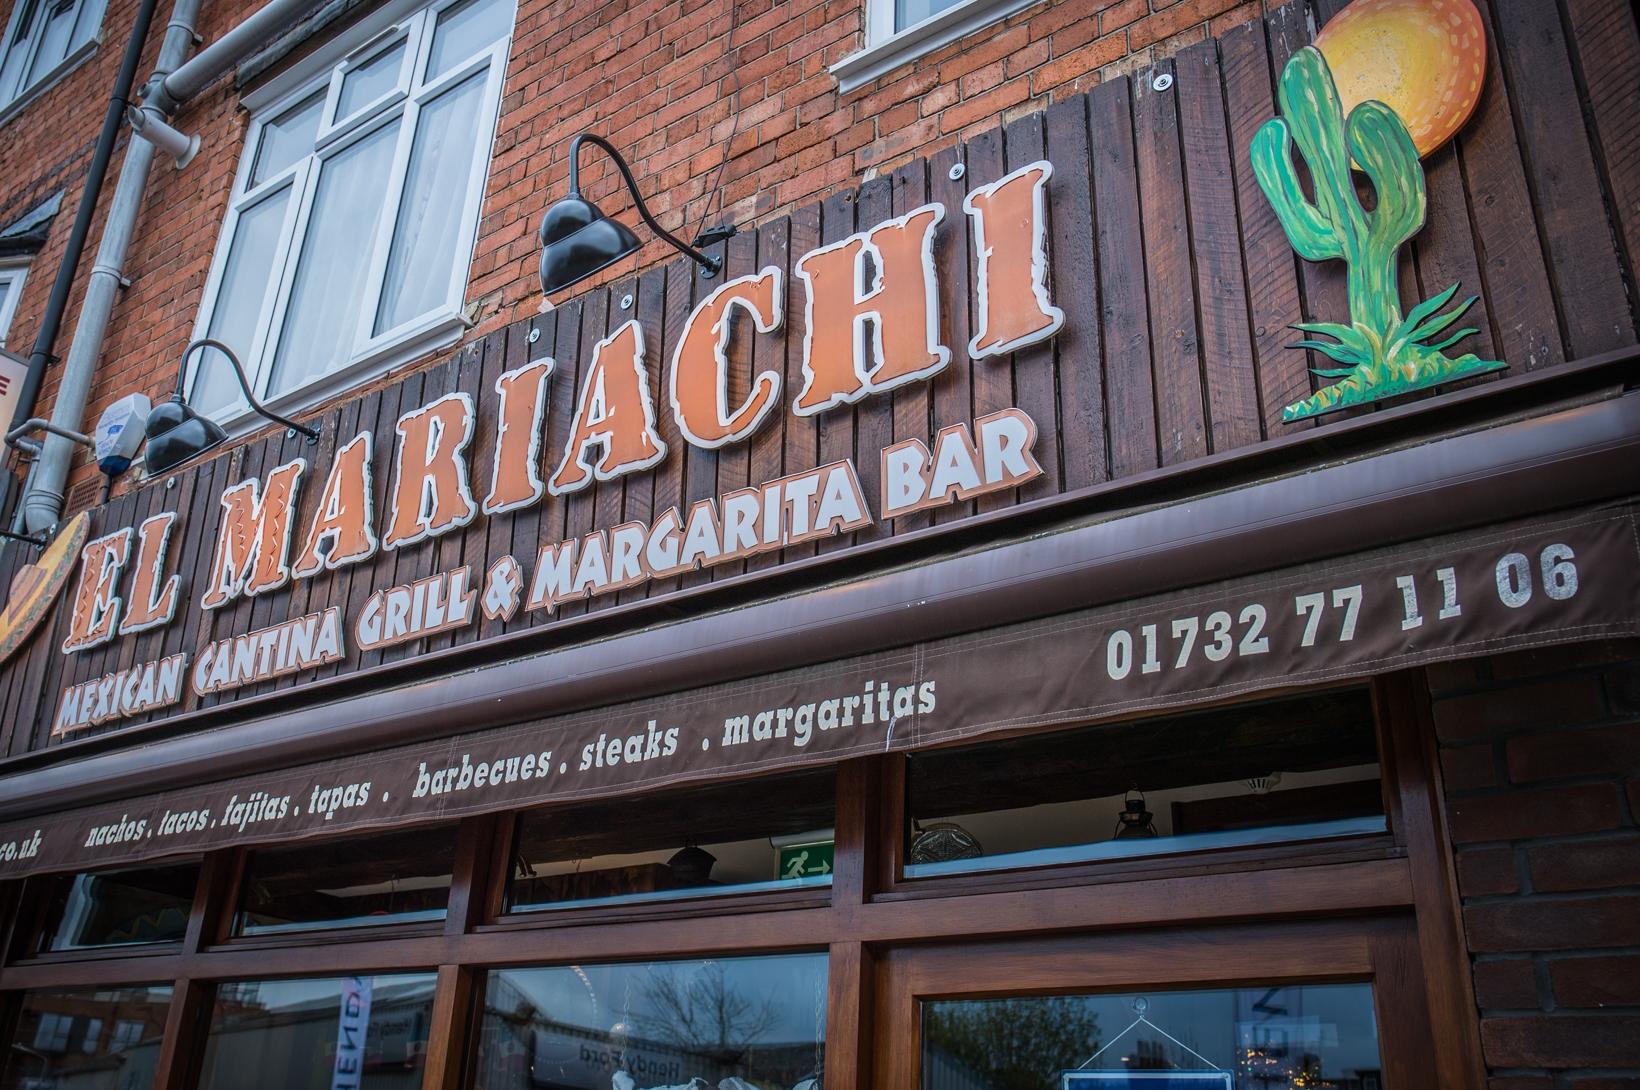 Photo courtesy of El Mariachi restaurant